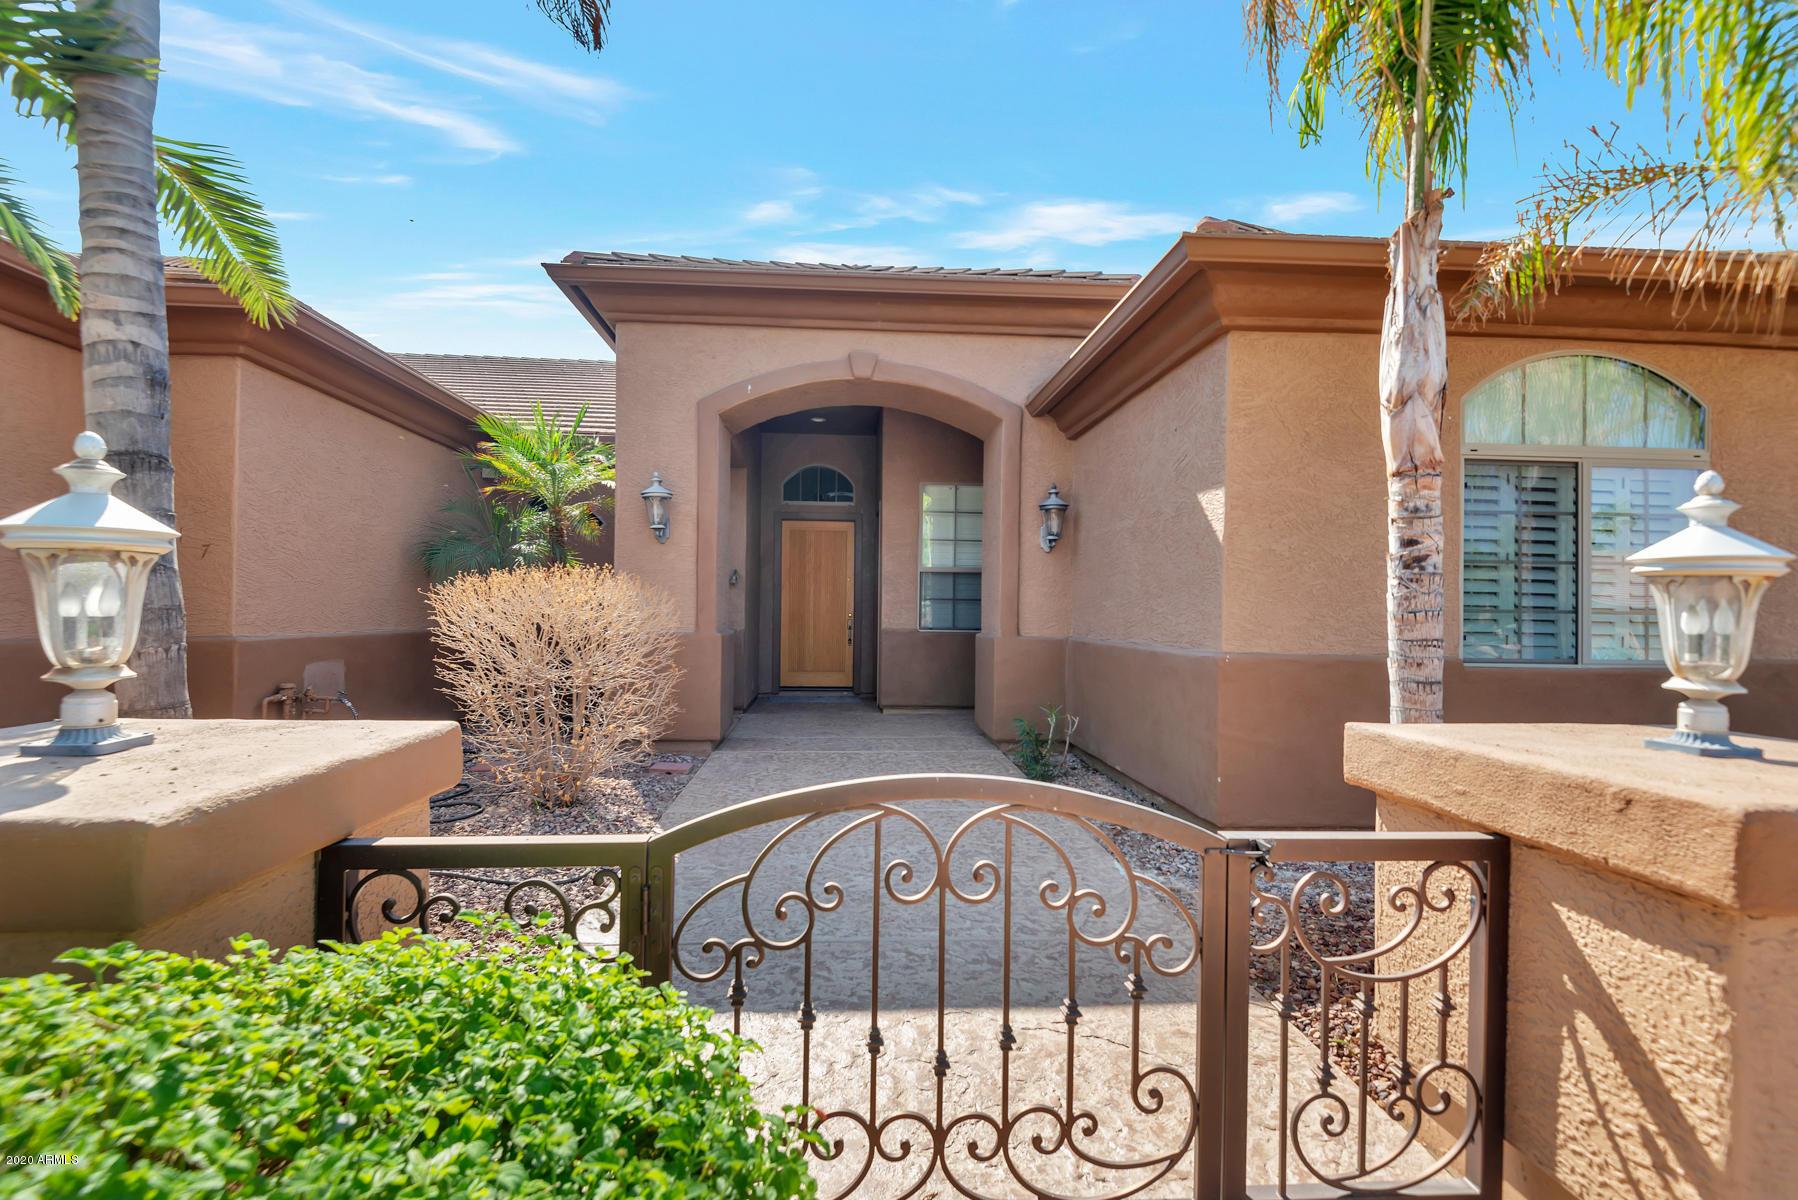 MLS 6149959 18017 W GEORGIA Court, Litchfield Park, AZ 85340 Litchfield Park AZ Three Bedroom